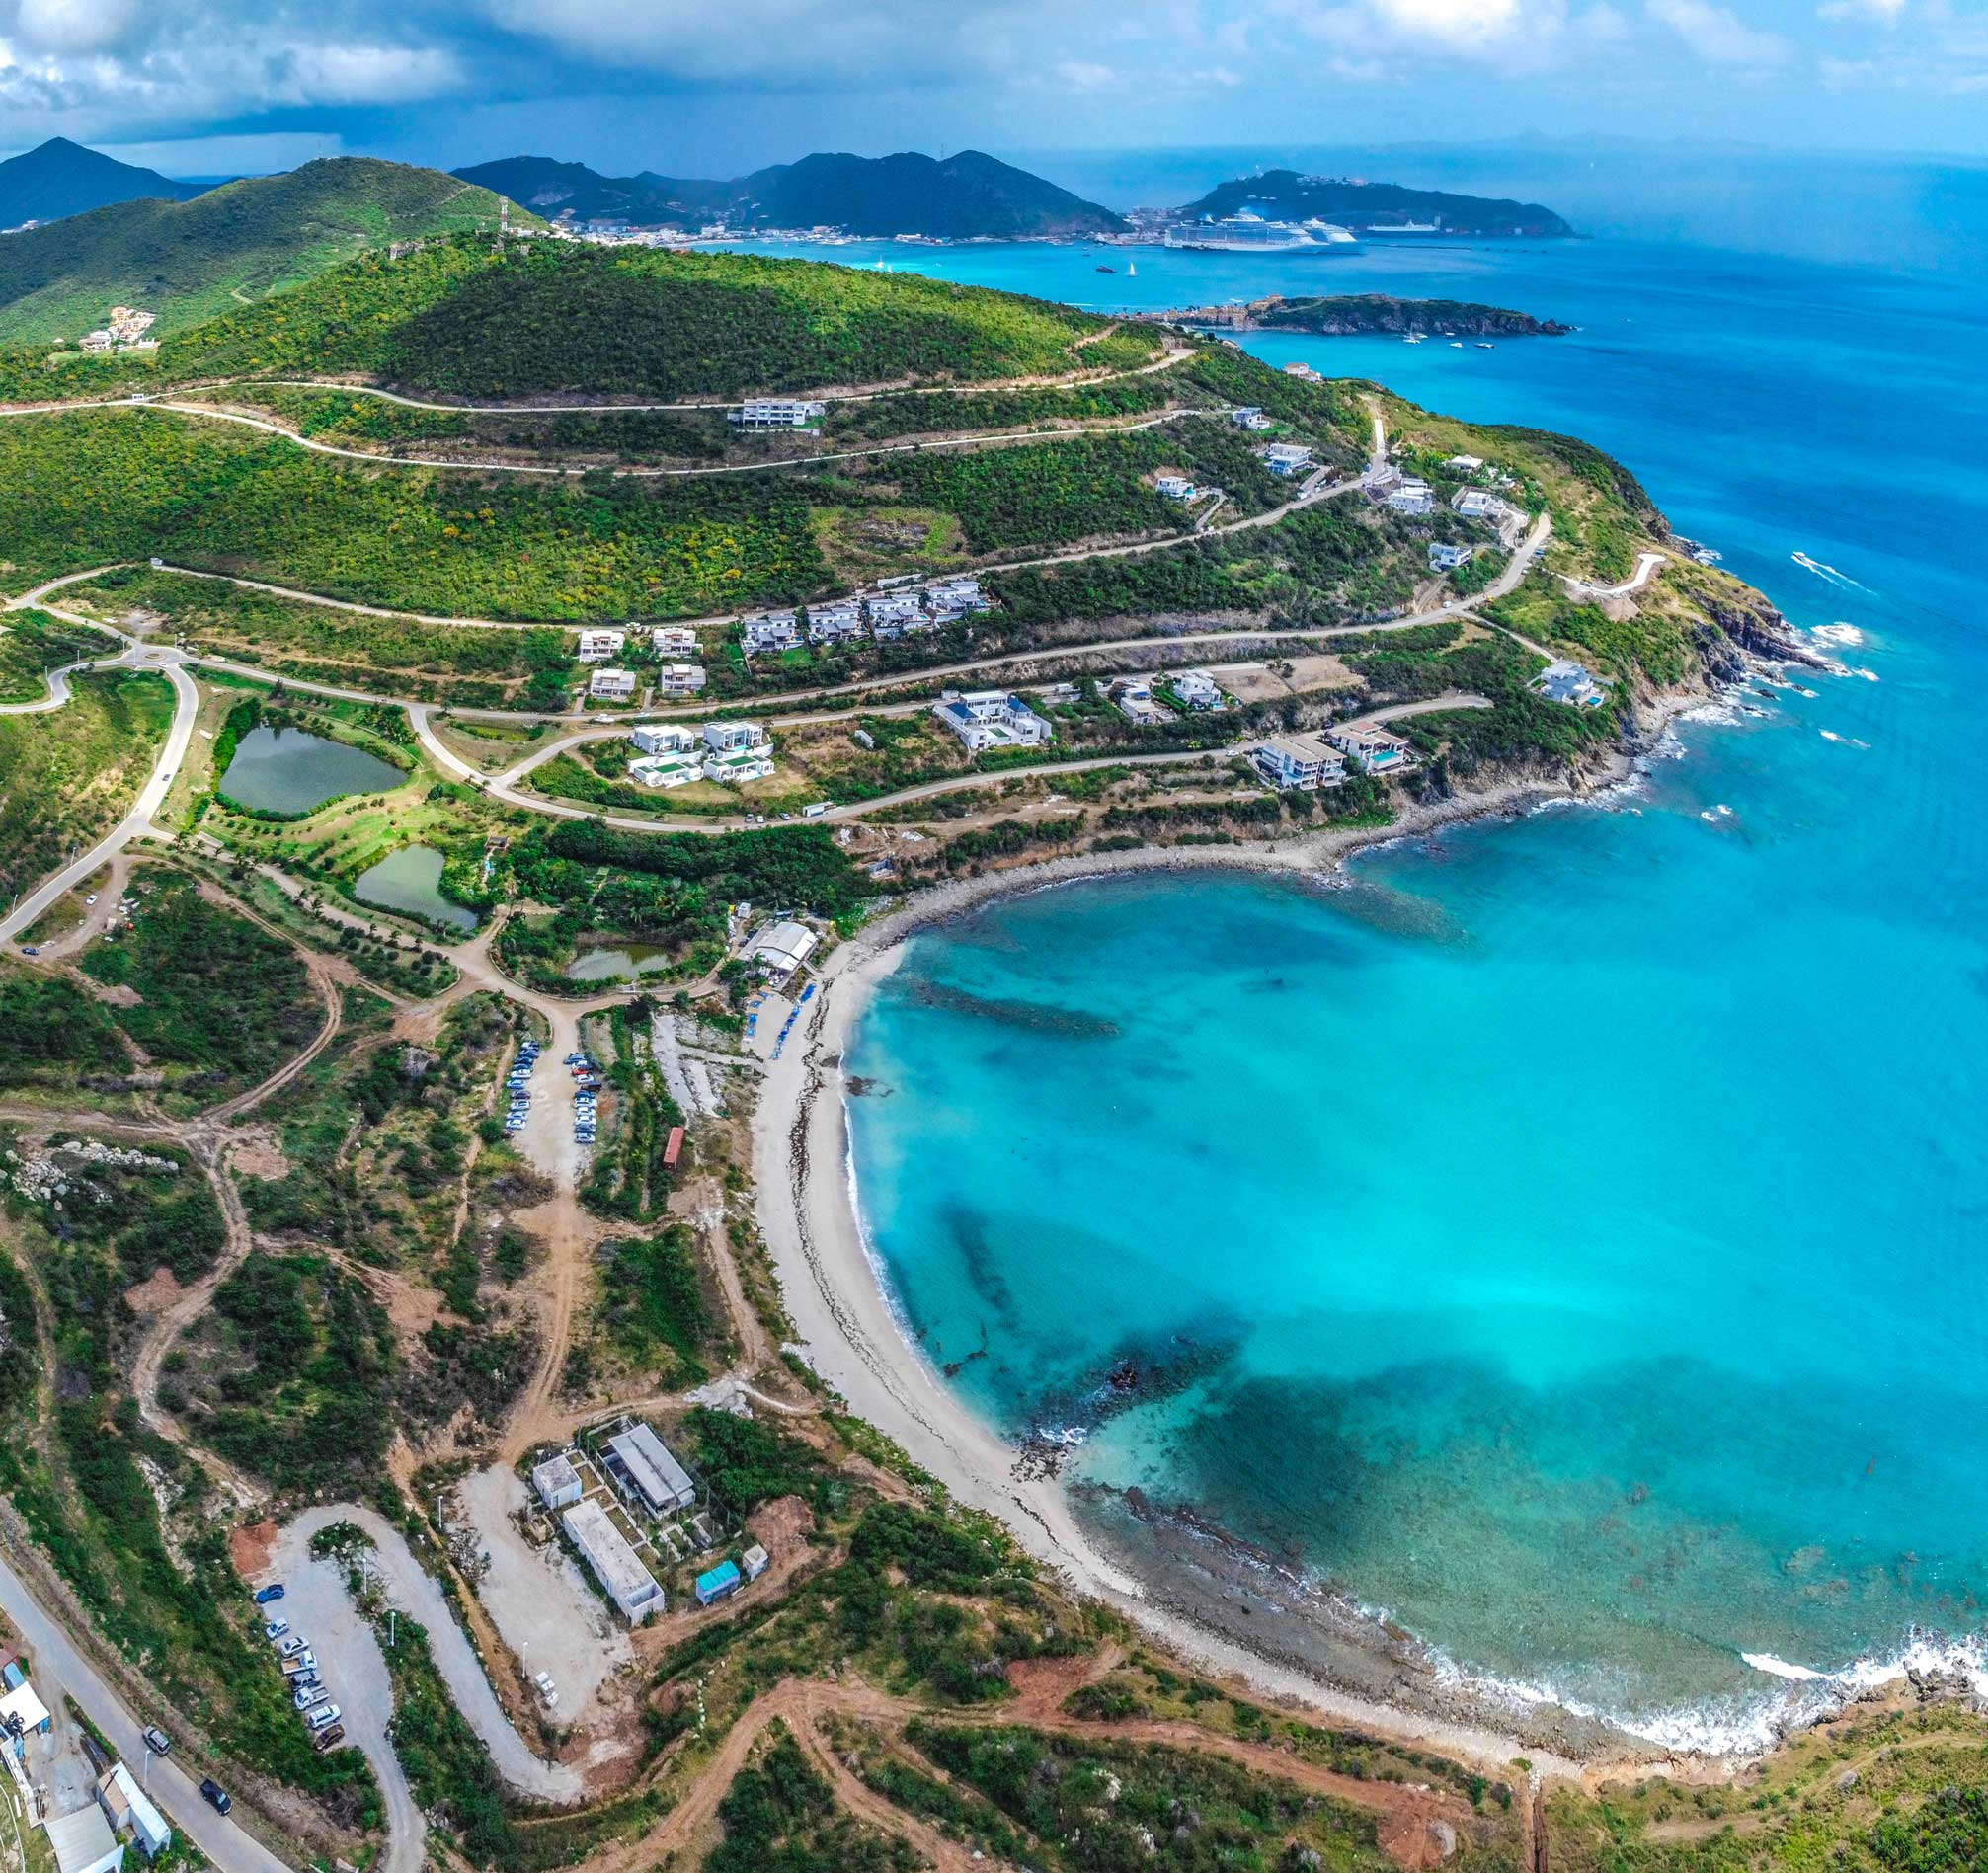 St Maarten Covid Restrictions 2021